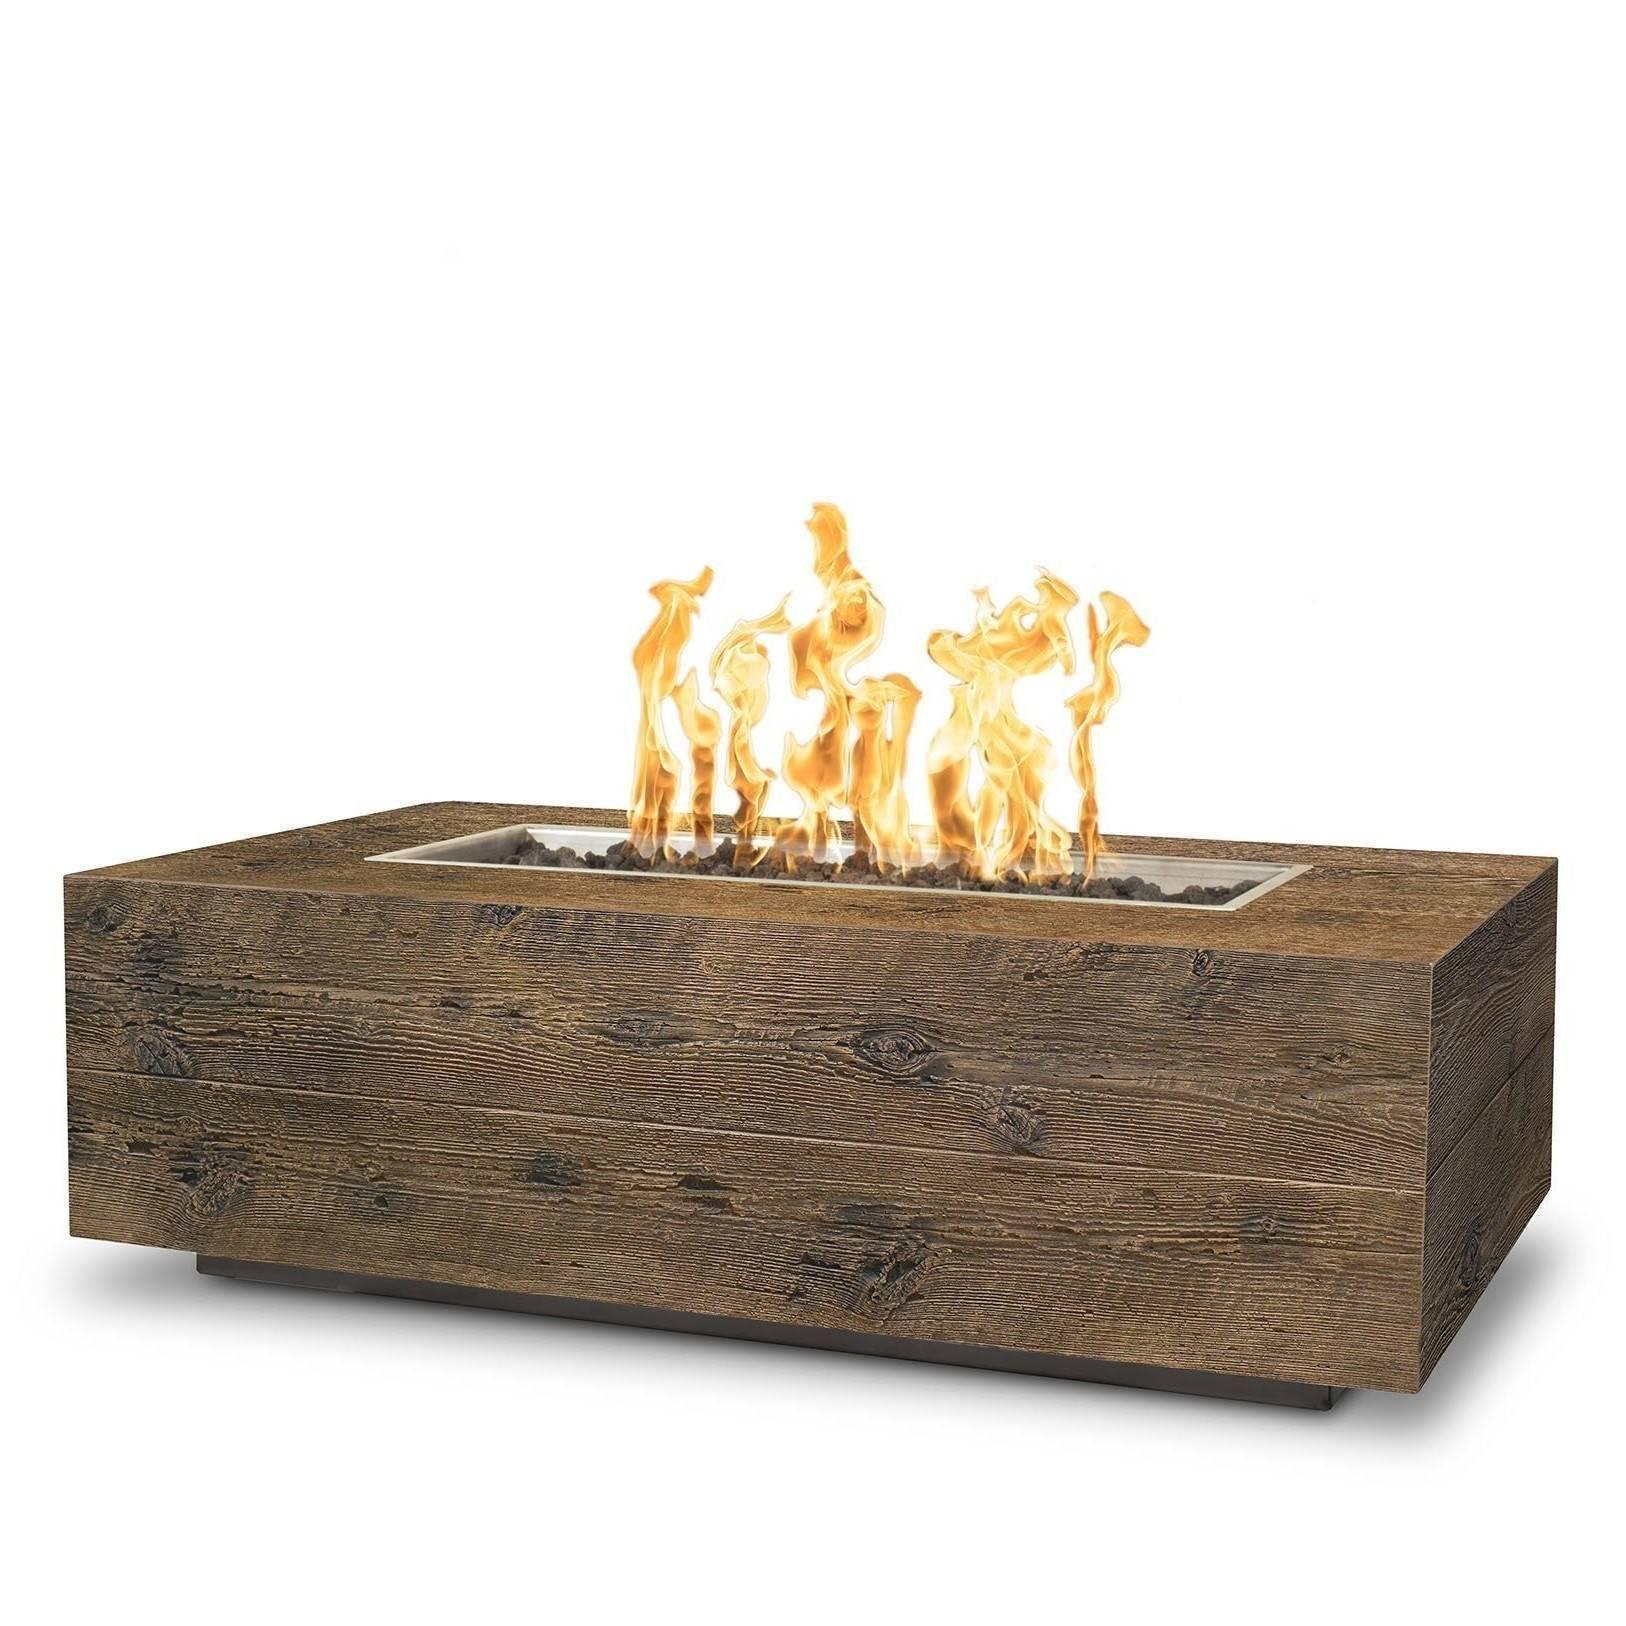 "48"" Coronado Wood Grain Concrete Fire Pit Table - Oak"